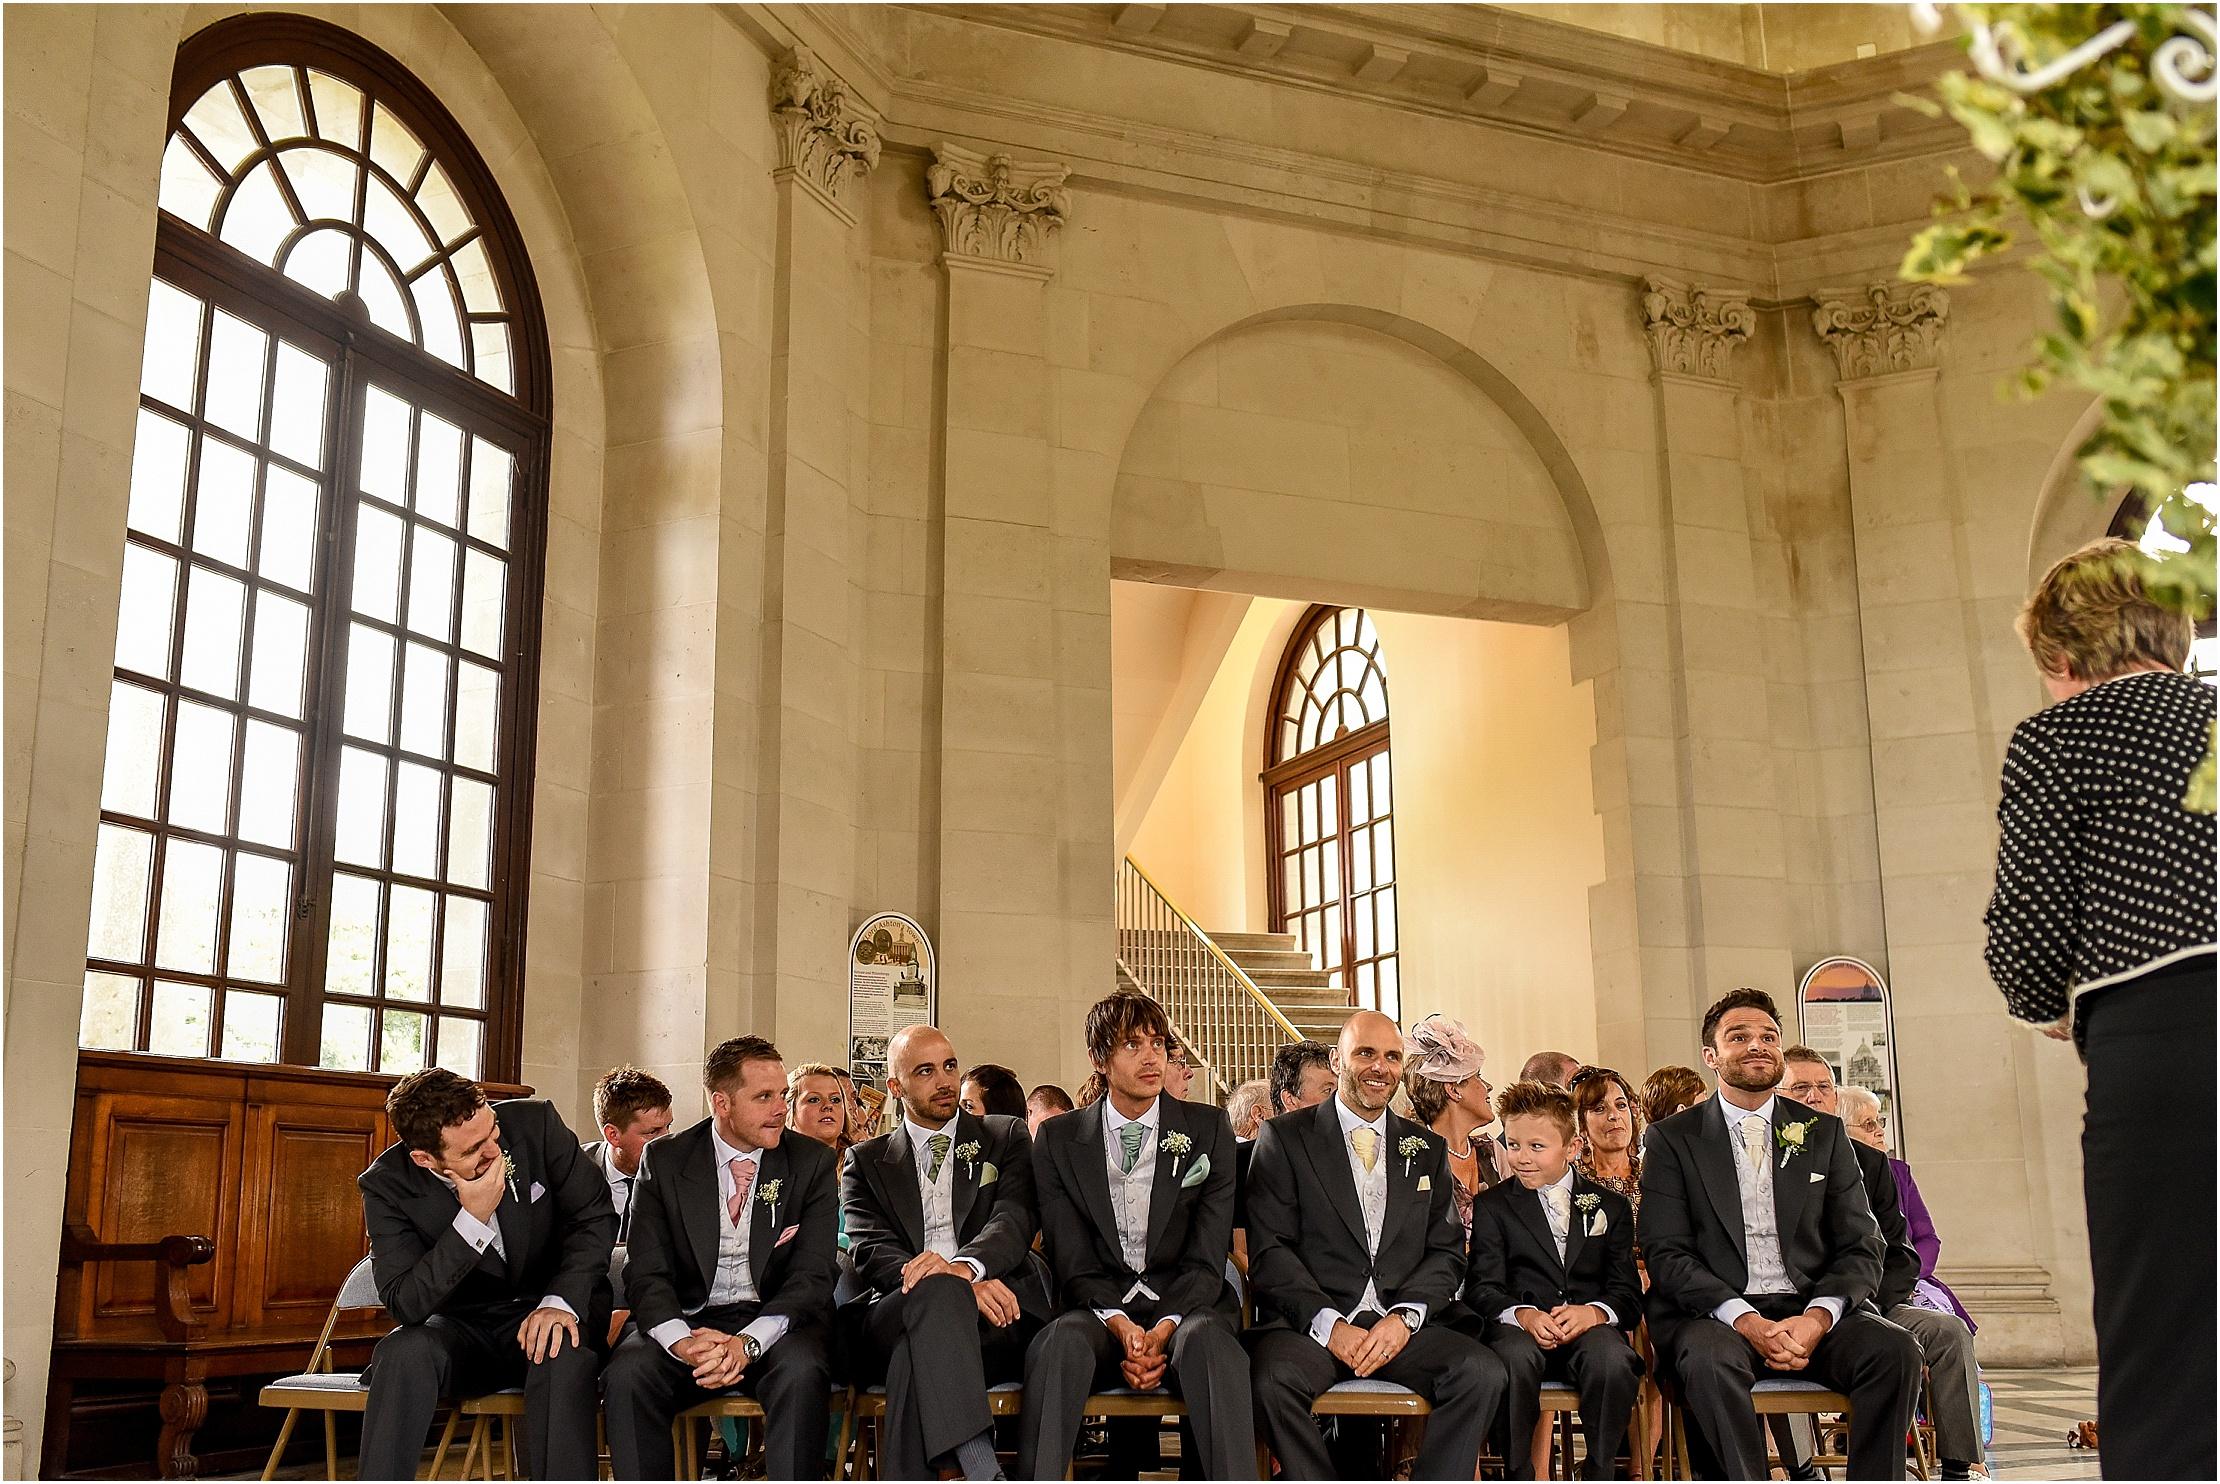 staining-lodge-wedding-047.jpg